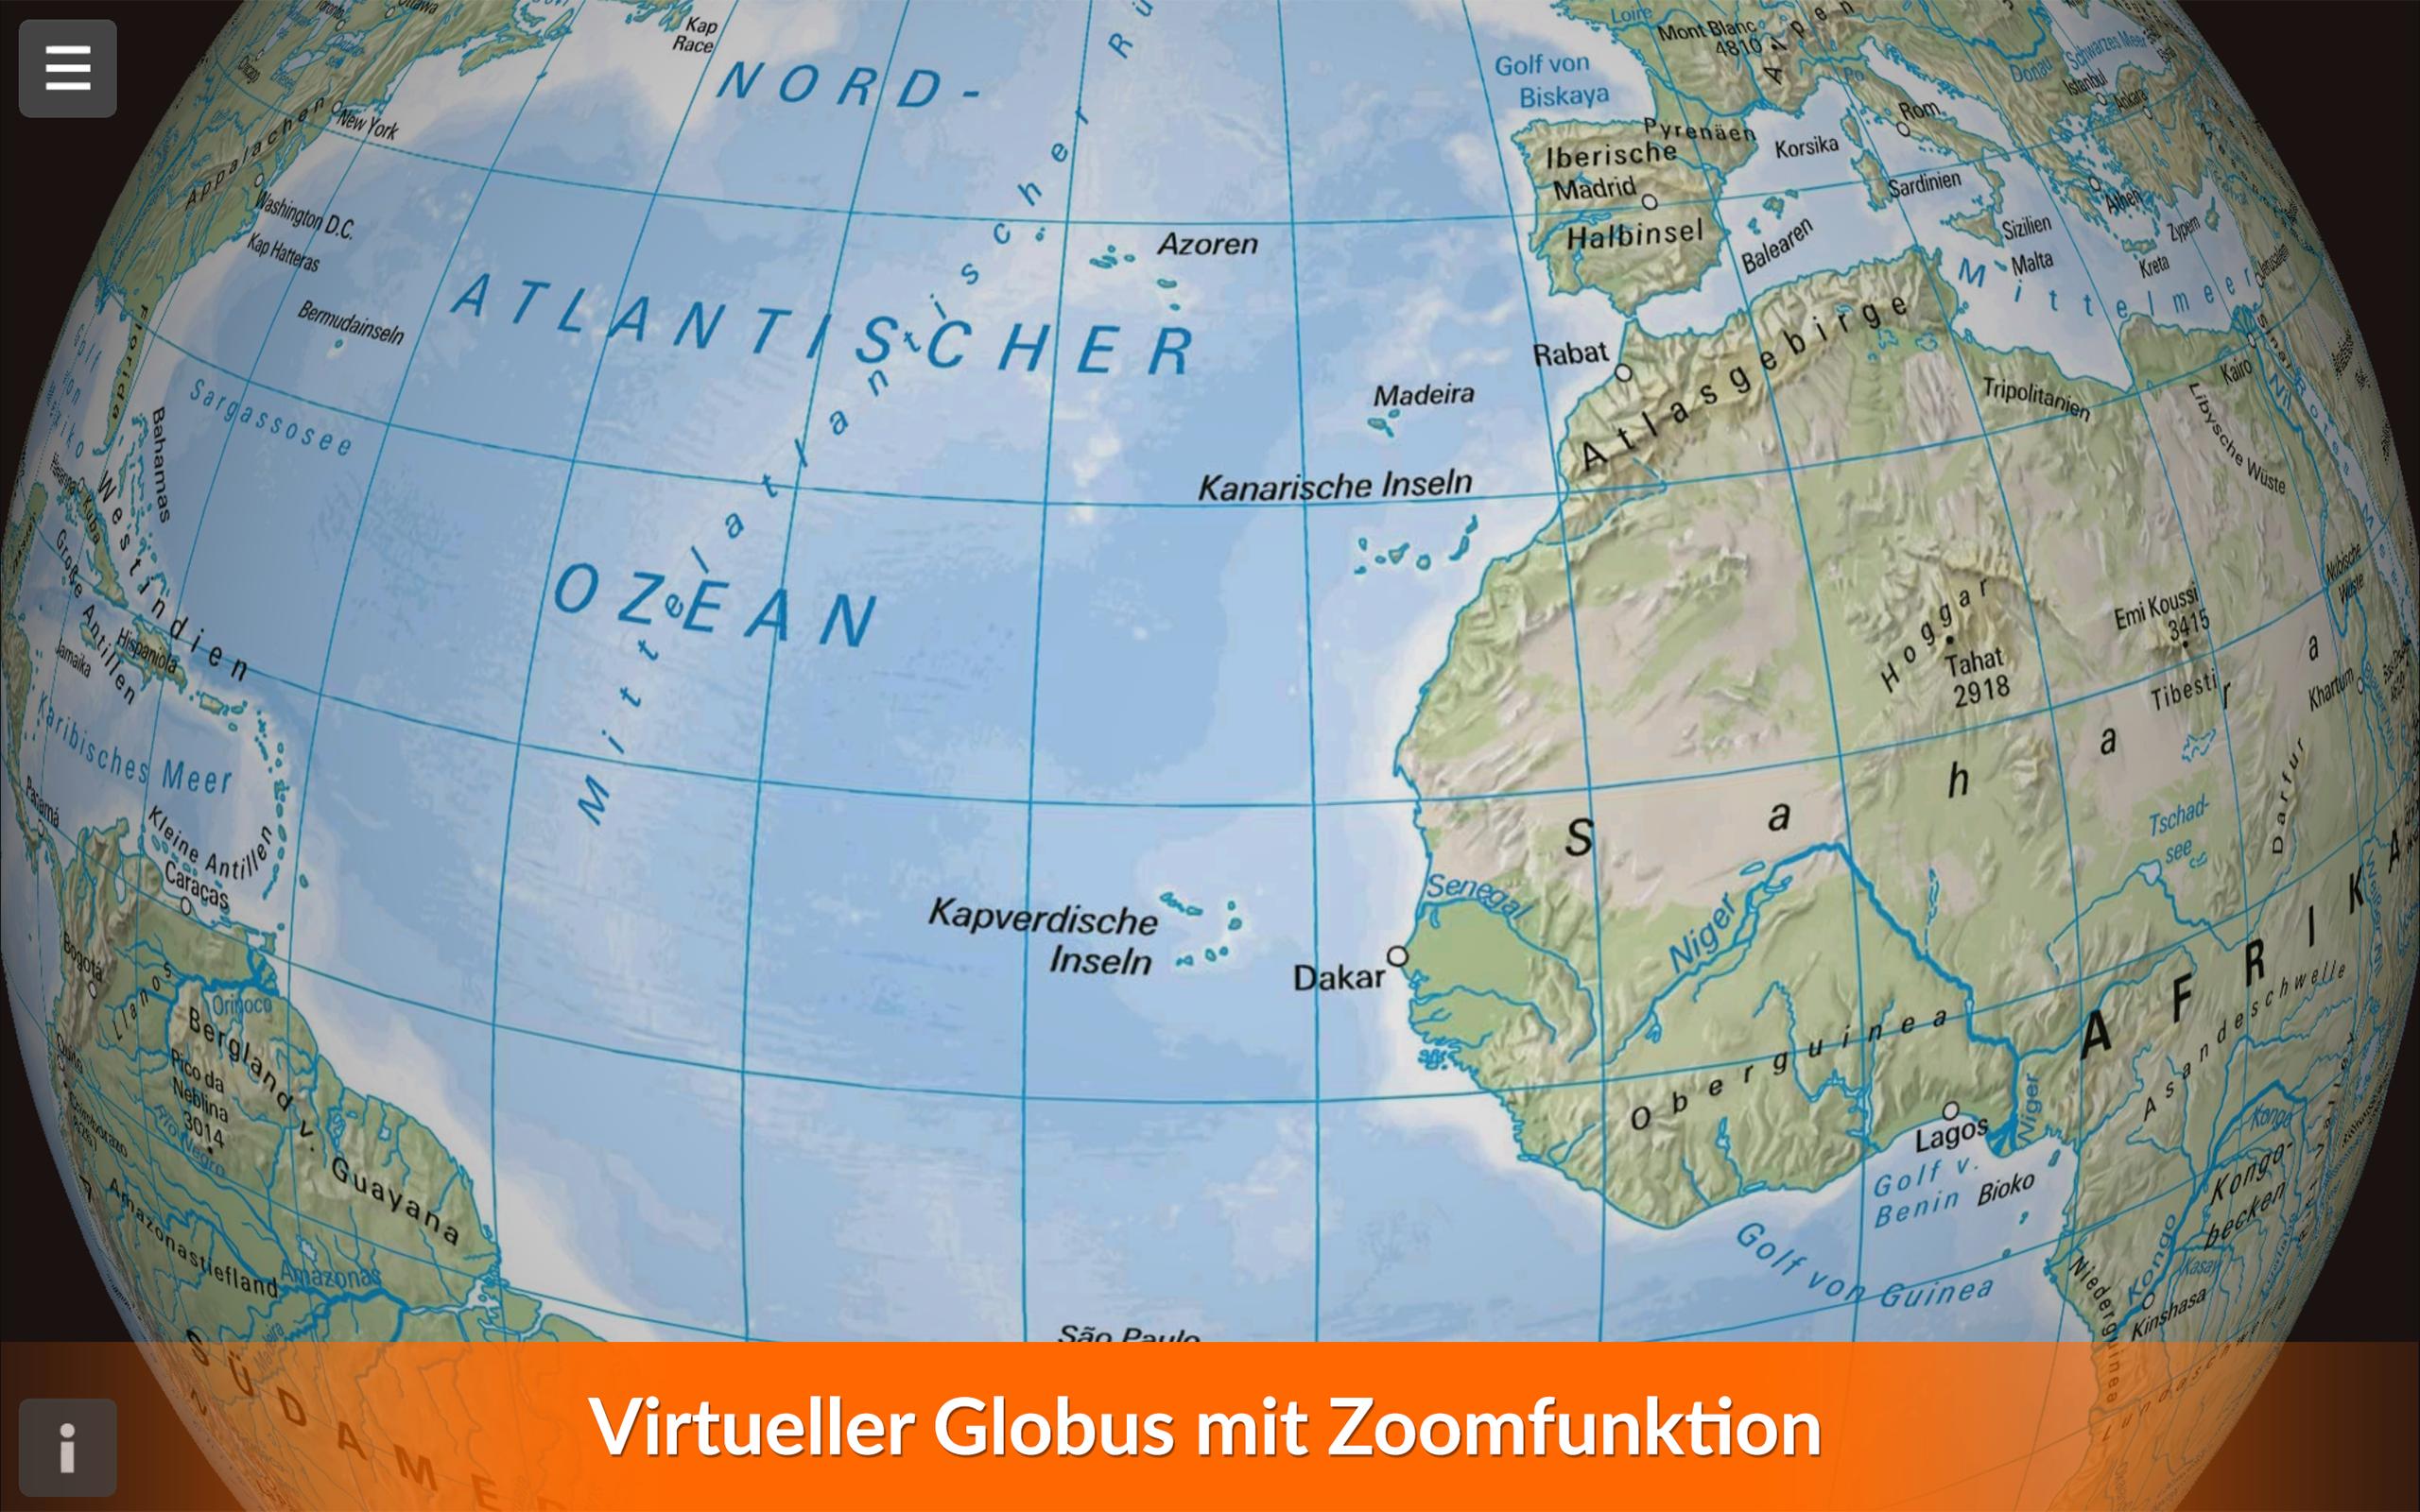 Azoren Karte Weltatlas.Kosmos Weltatlas Amazon De Apps Für Android